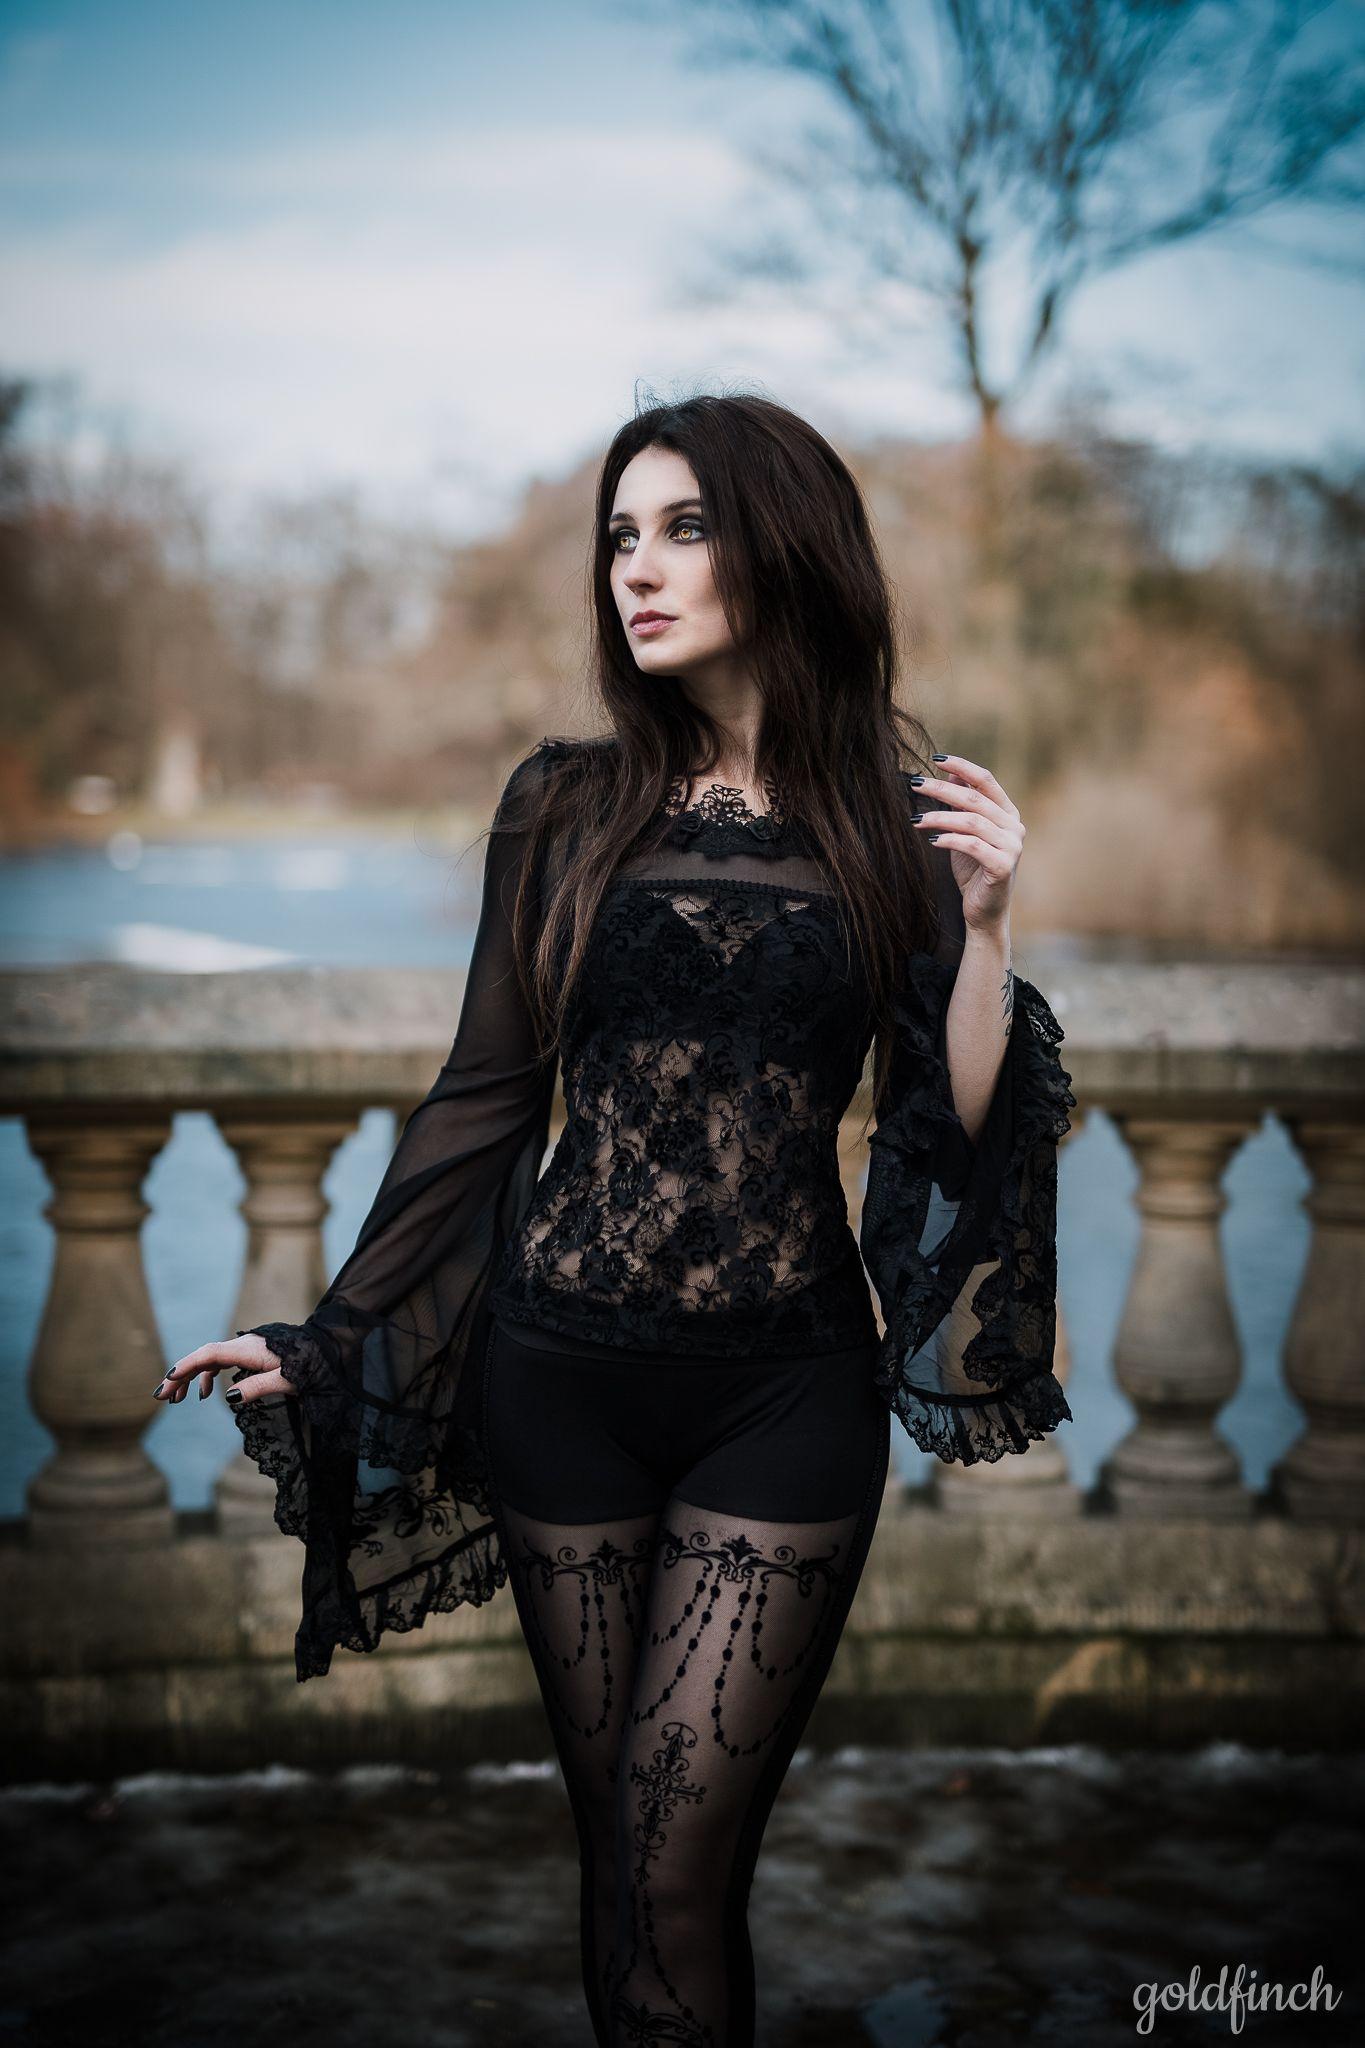 Goth randí s gothy